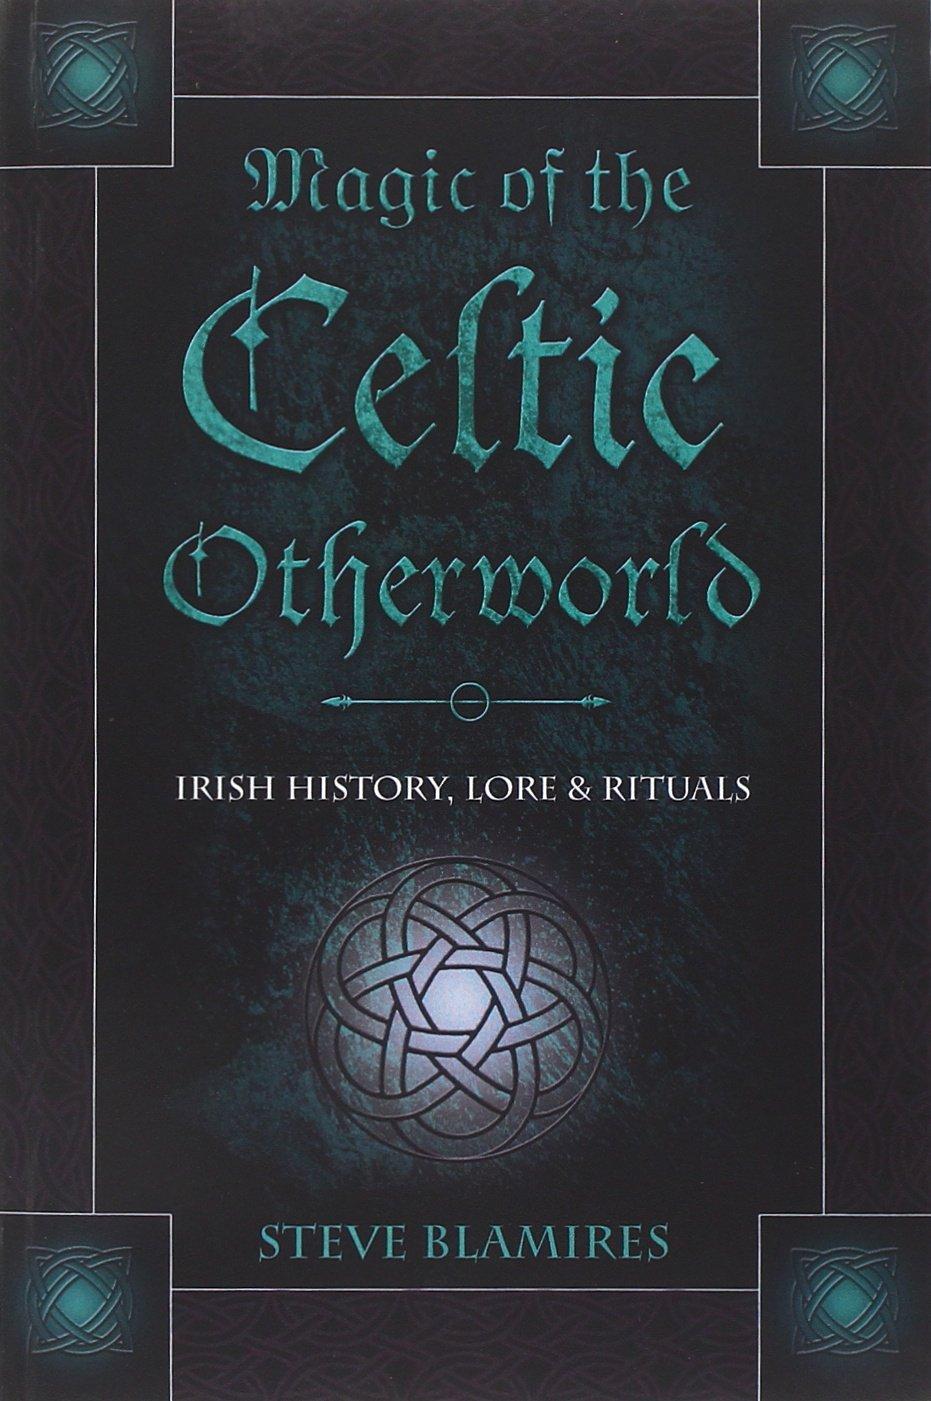 Magic Of The Celtic Otherworld: Irish History, Lore & Rituals (llewellyn's  Celtic Wisdom): Stephen Blamires: 9780738706573: Amazon: Books